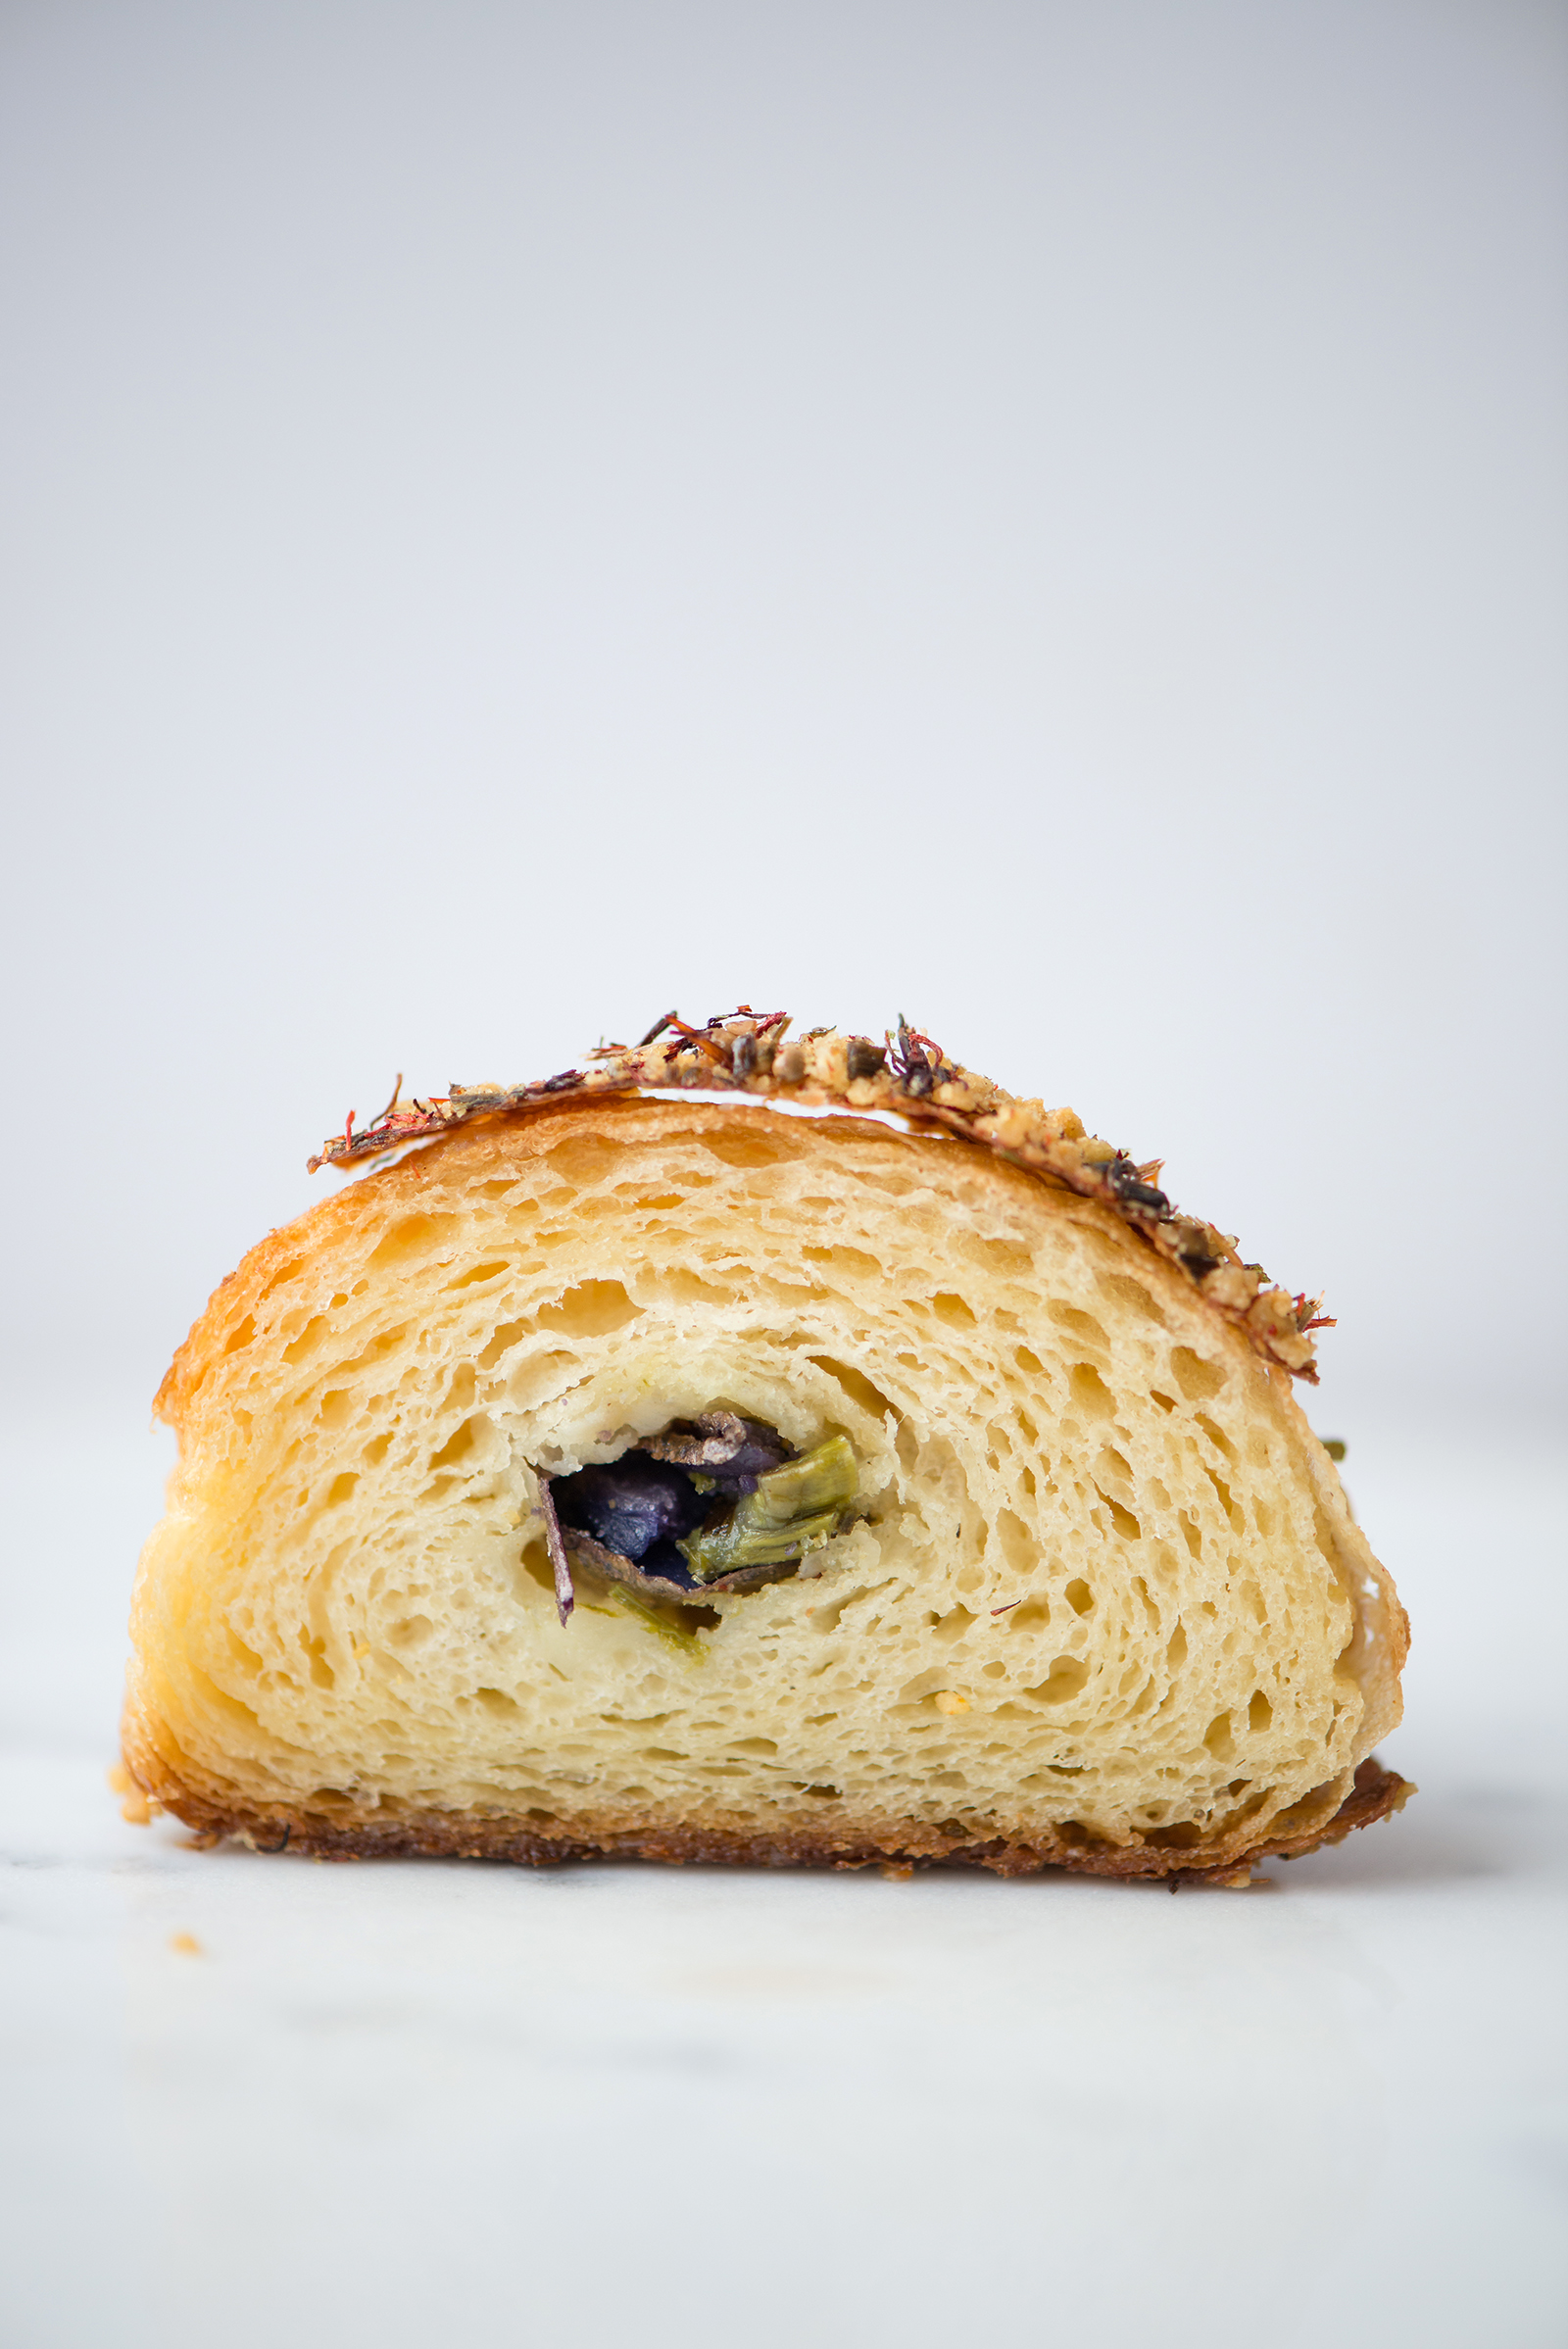 Purple Potato, Asparagus And Havarti Croissant Cross Section | Now, Forager | Teresa Floyd